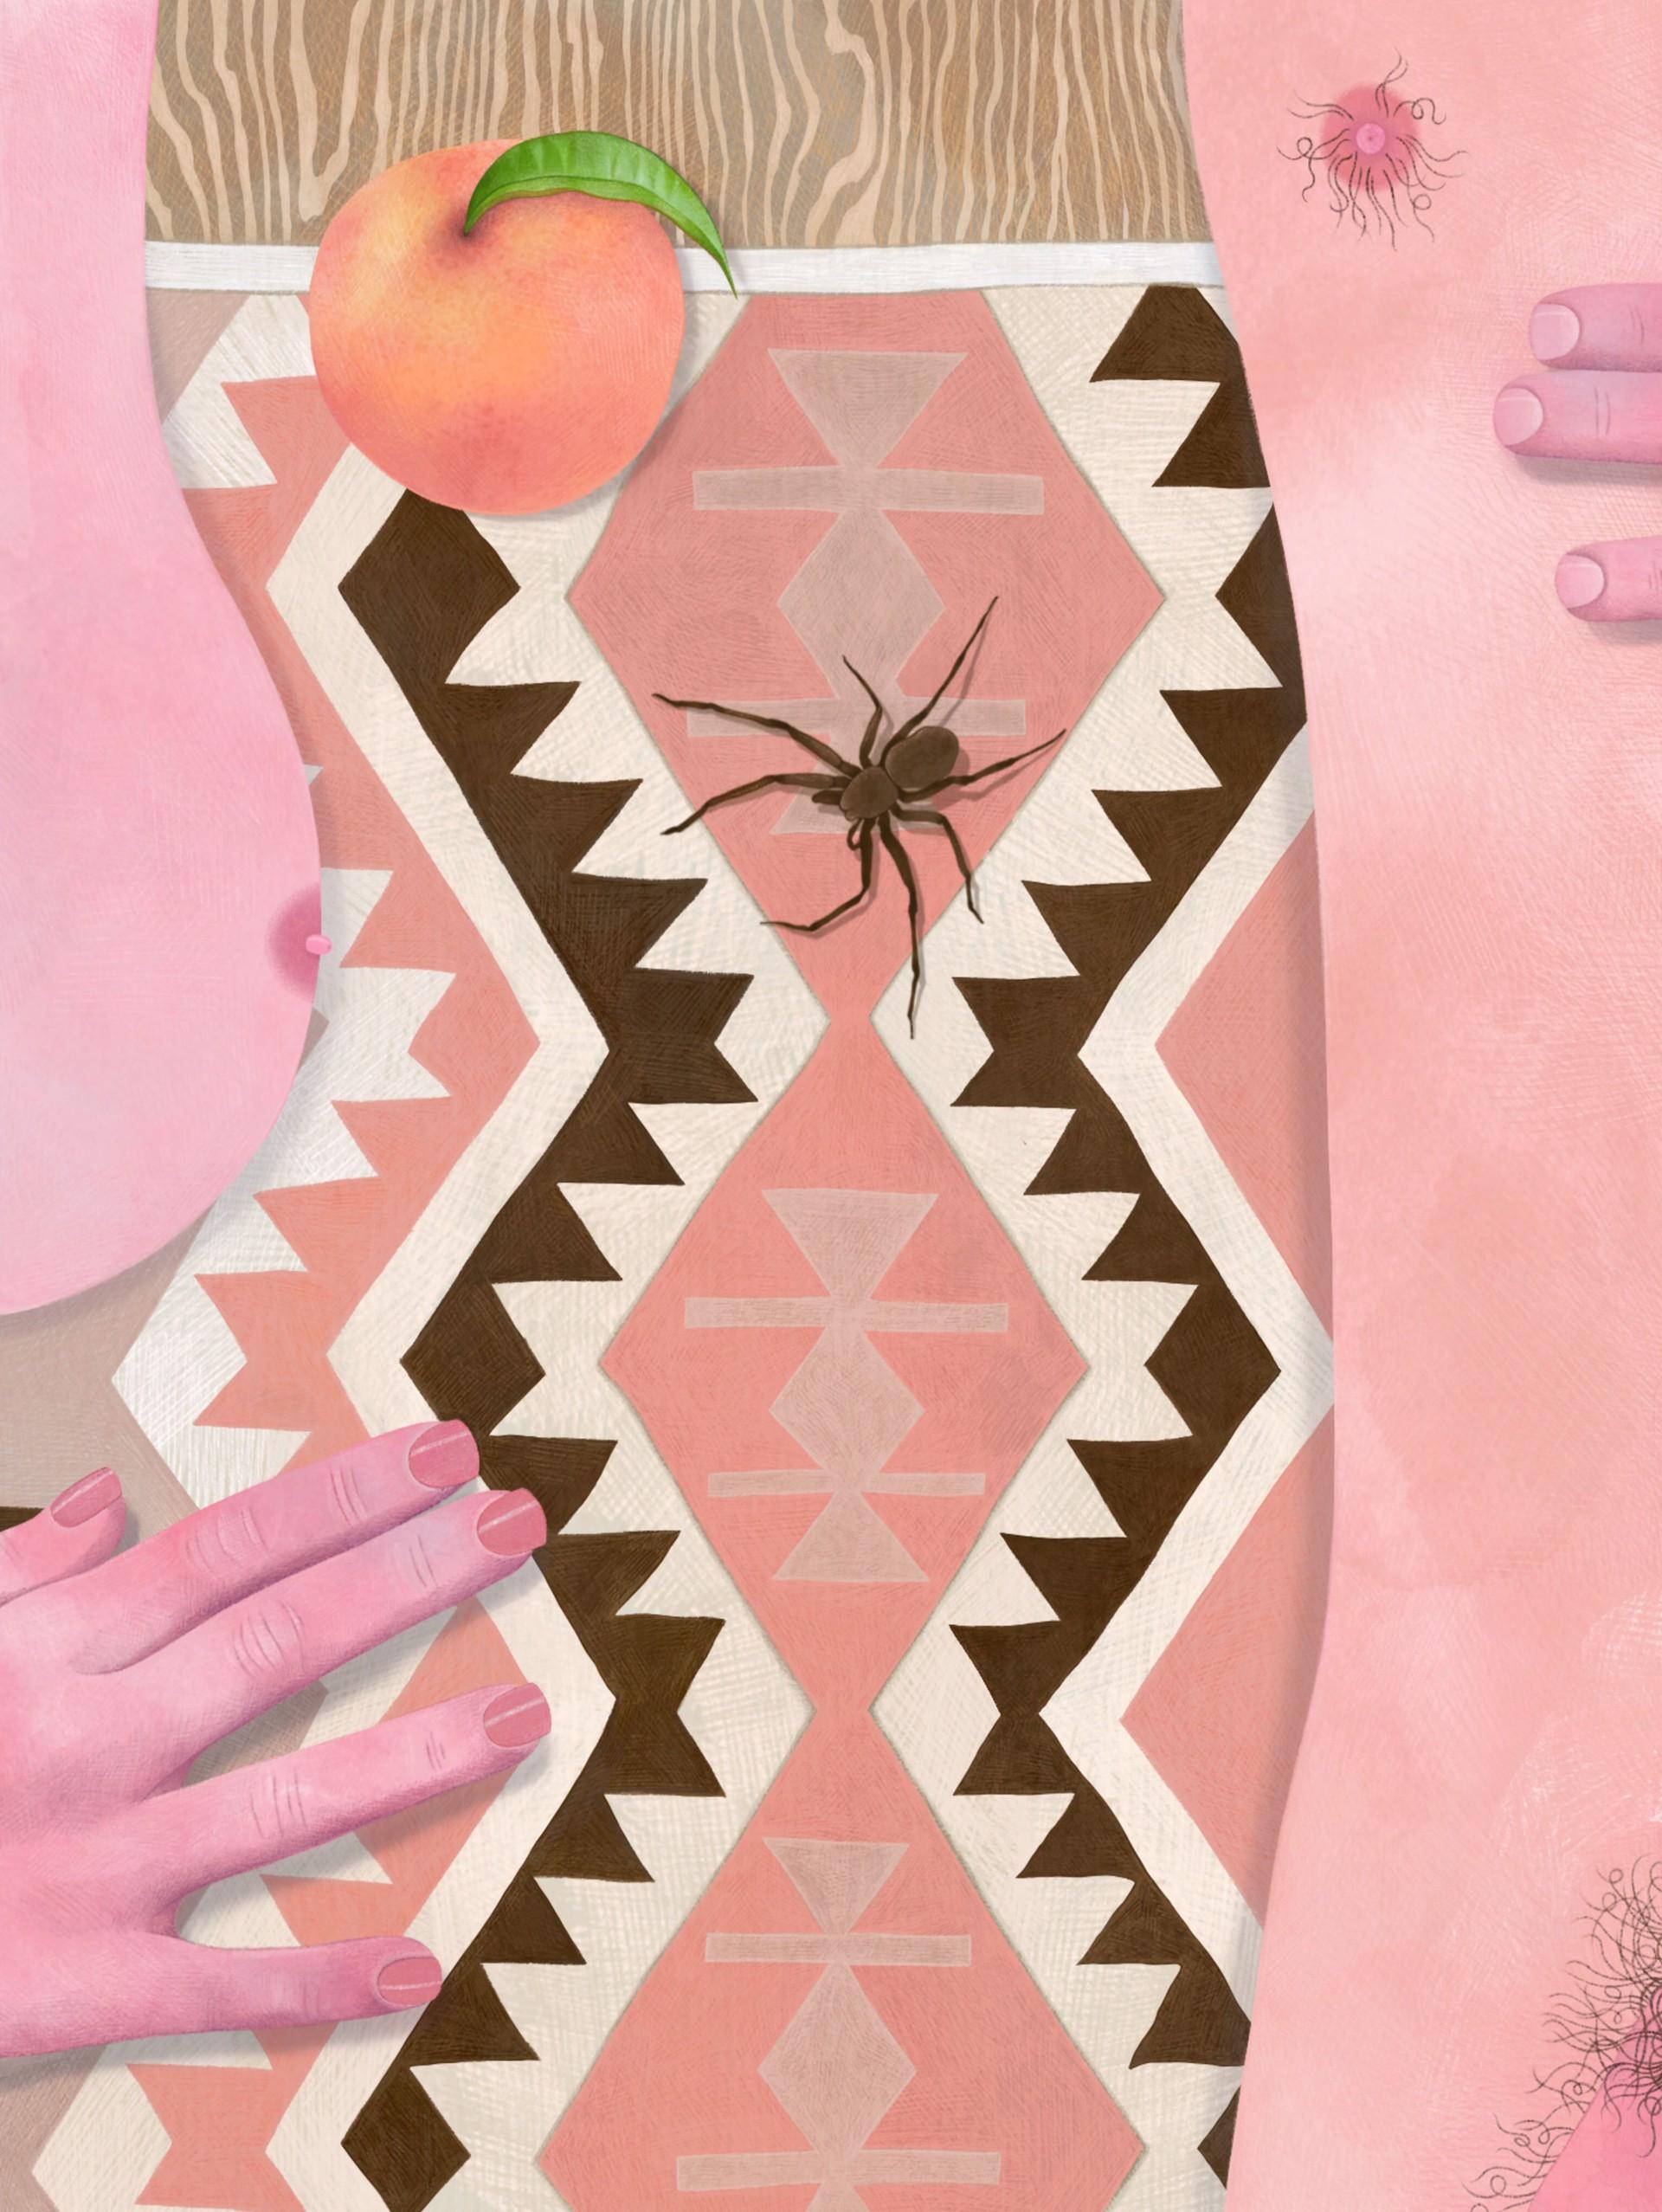 Creepy Crawly by Lauren Gallaspy